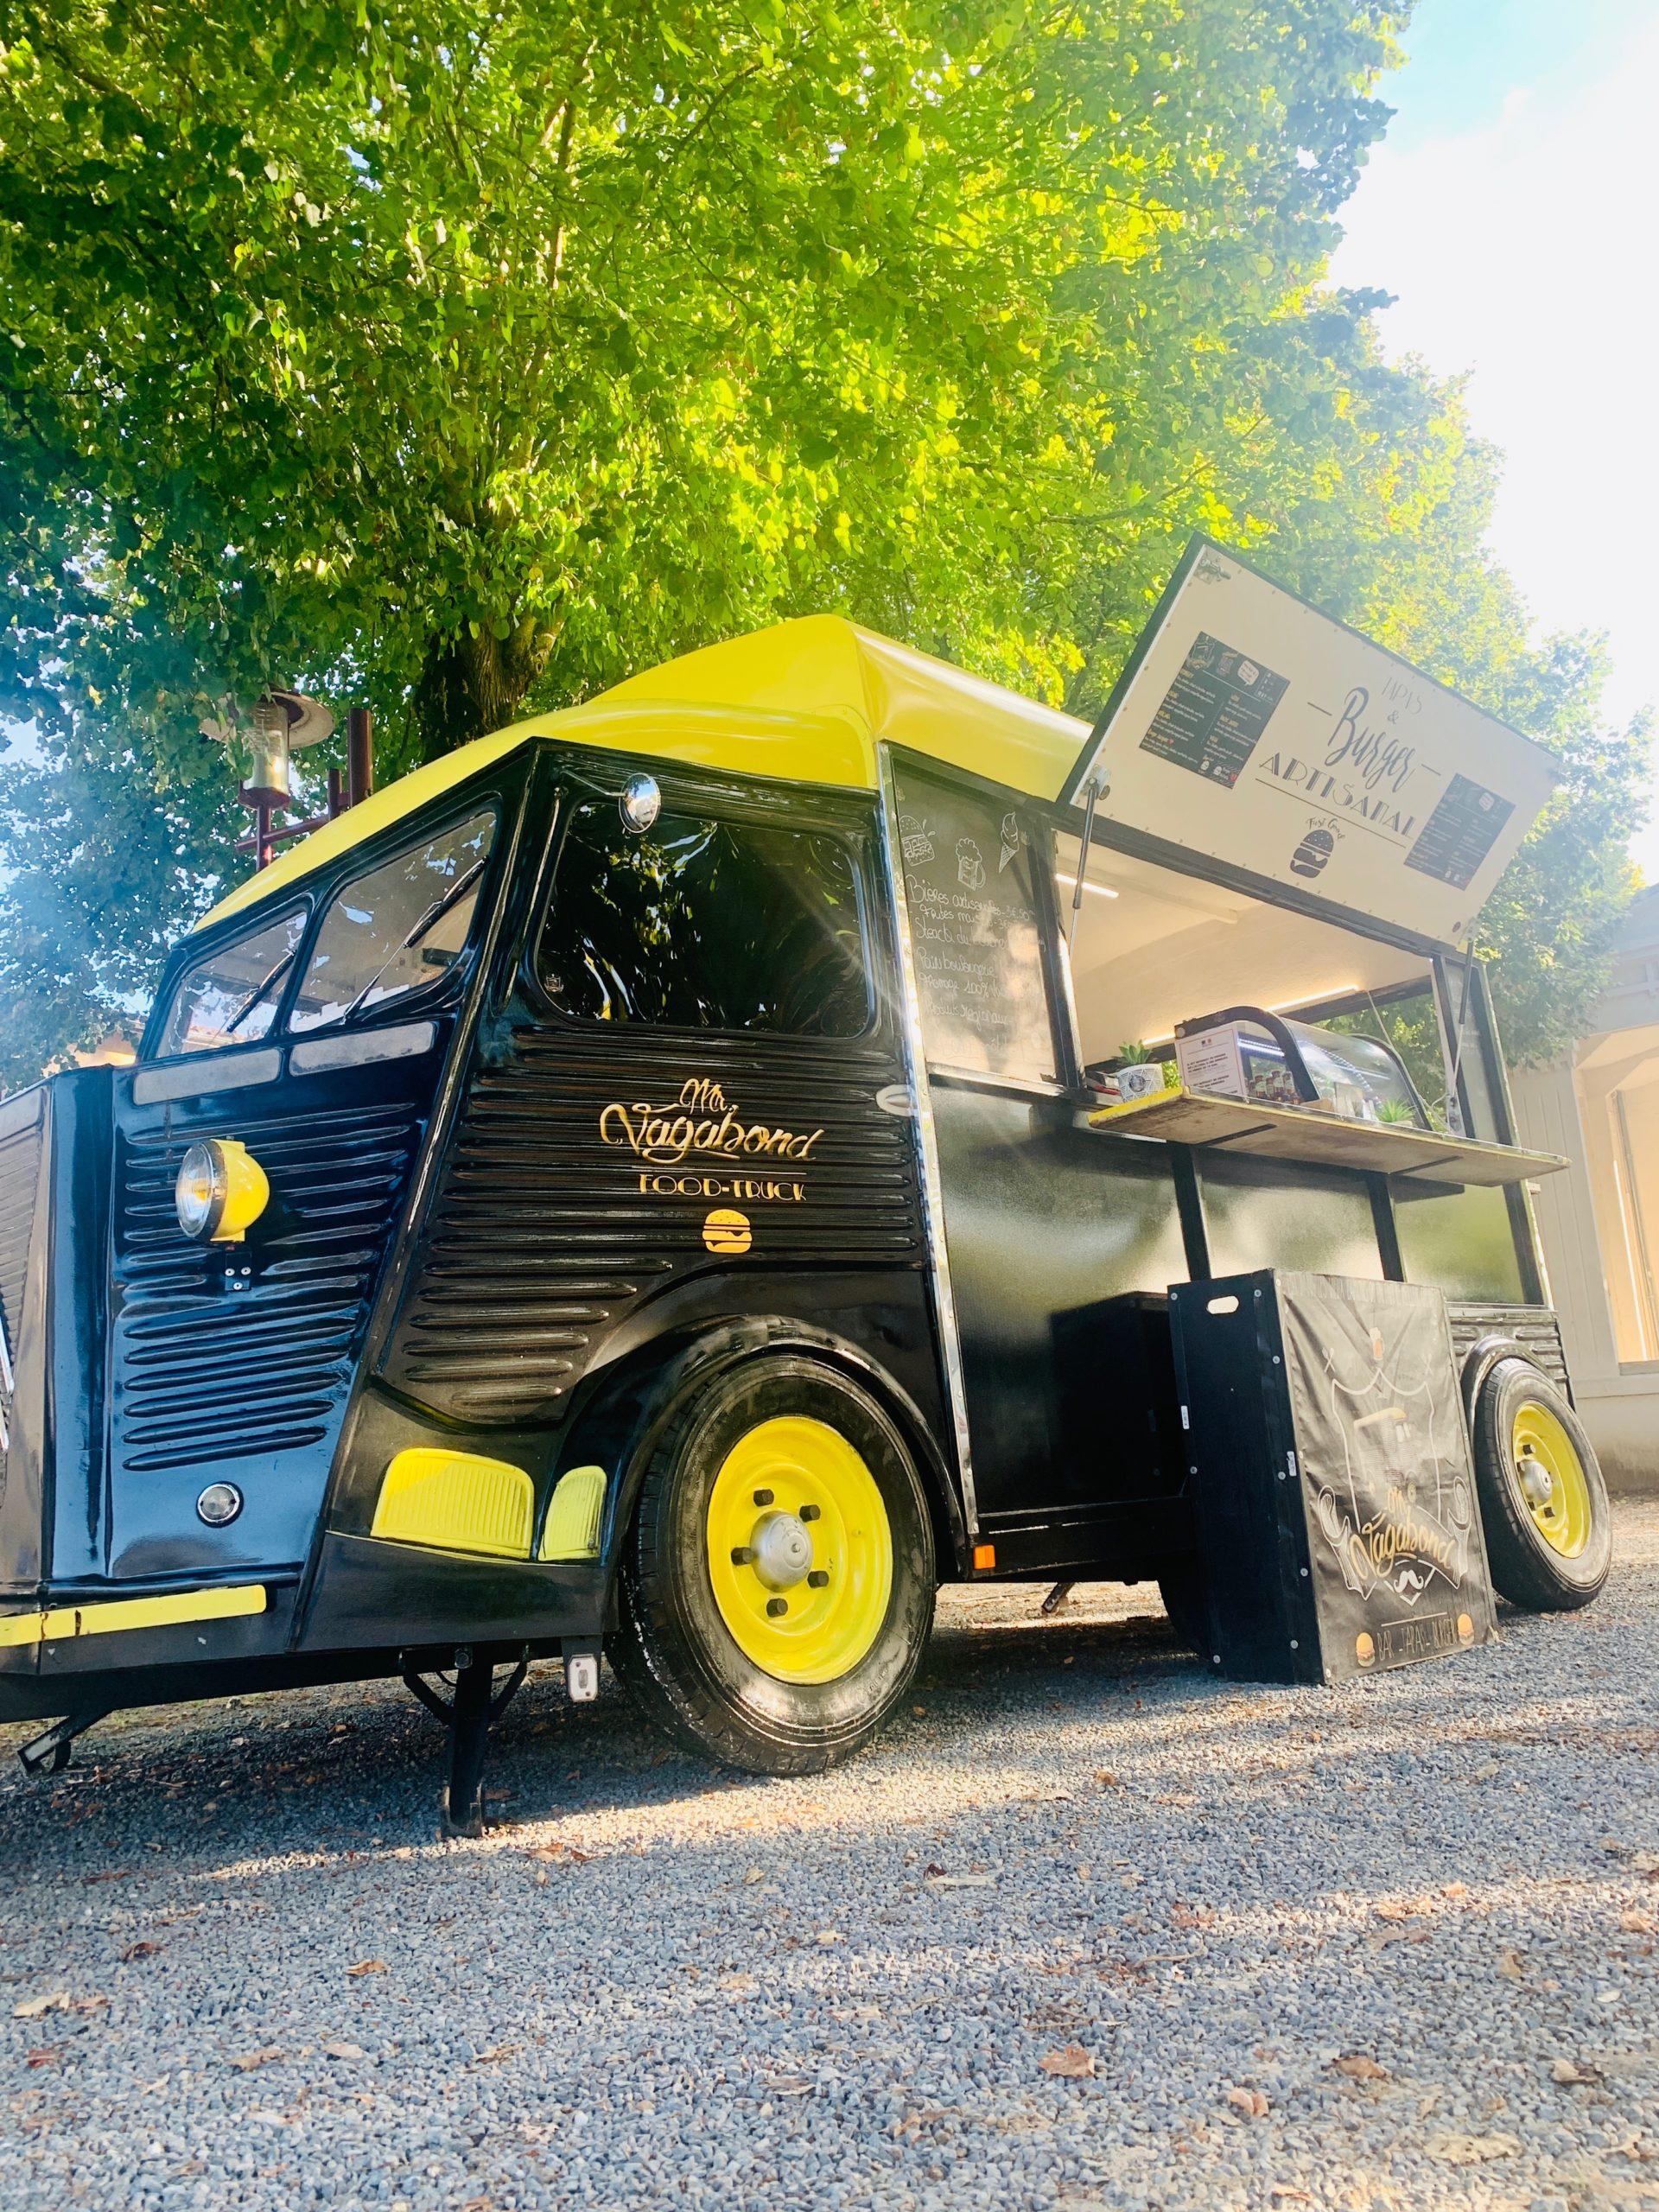 Food-Truck Mr Vagabond - Langon